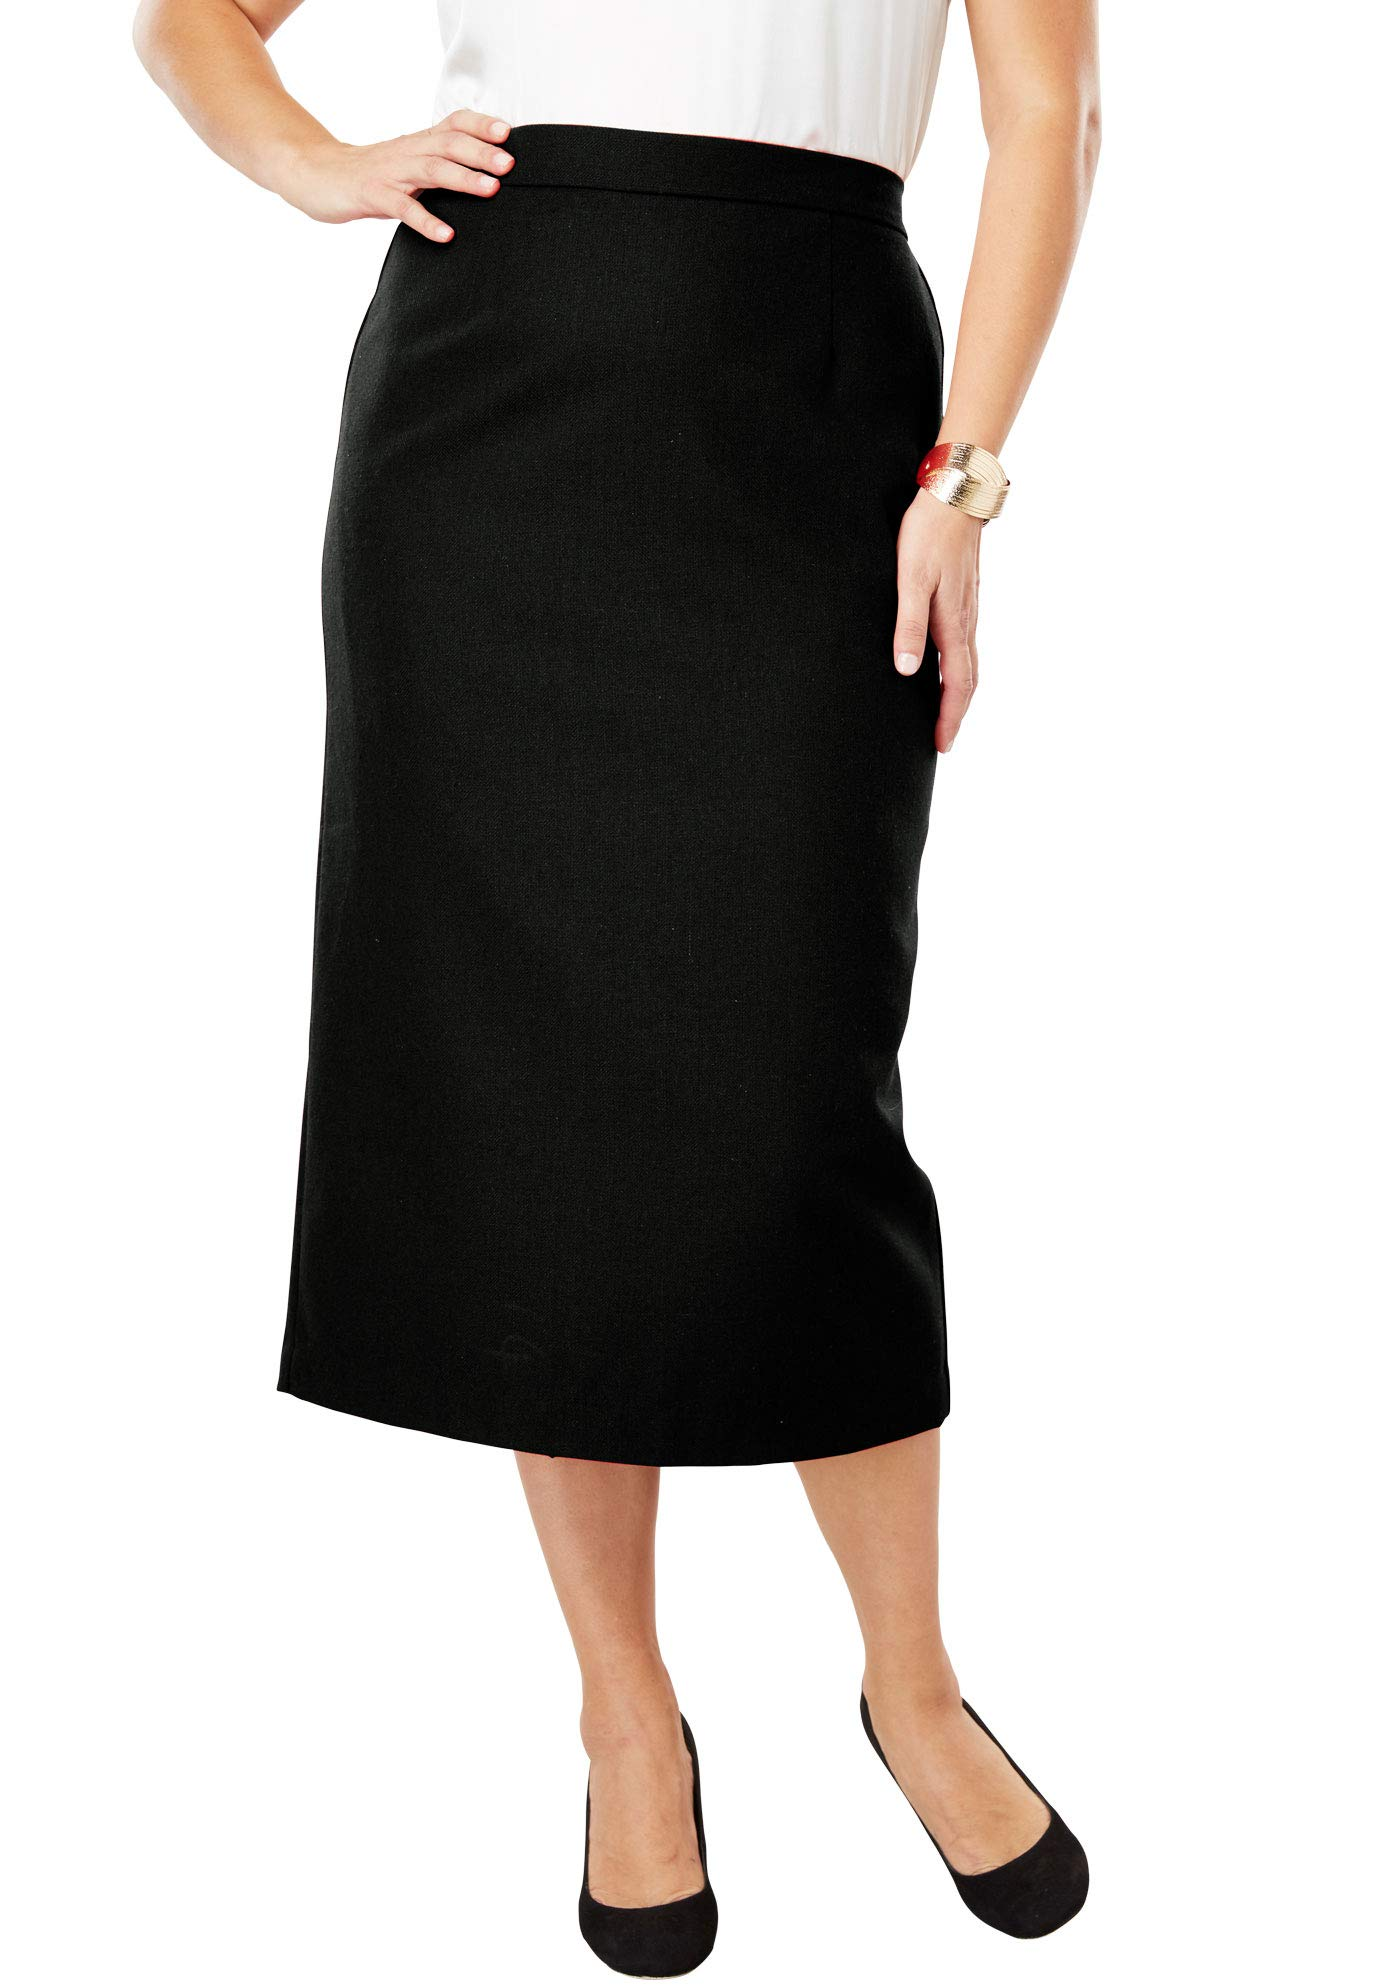 Jessica London Women's Plus Size Wool-Blend Midi Skirt - Black, 18 W by Jessica London